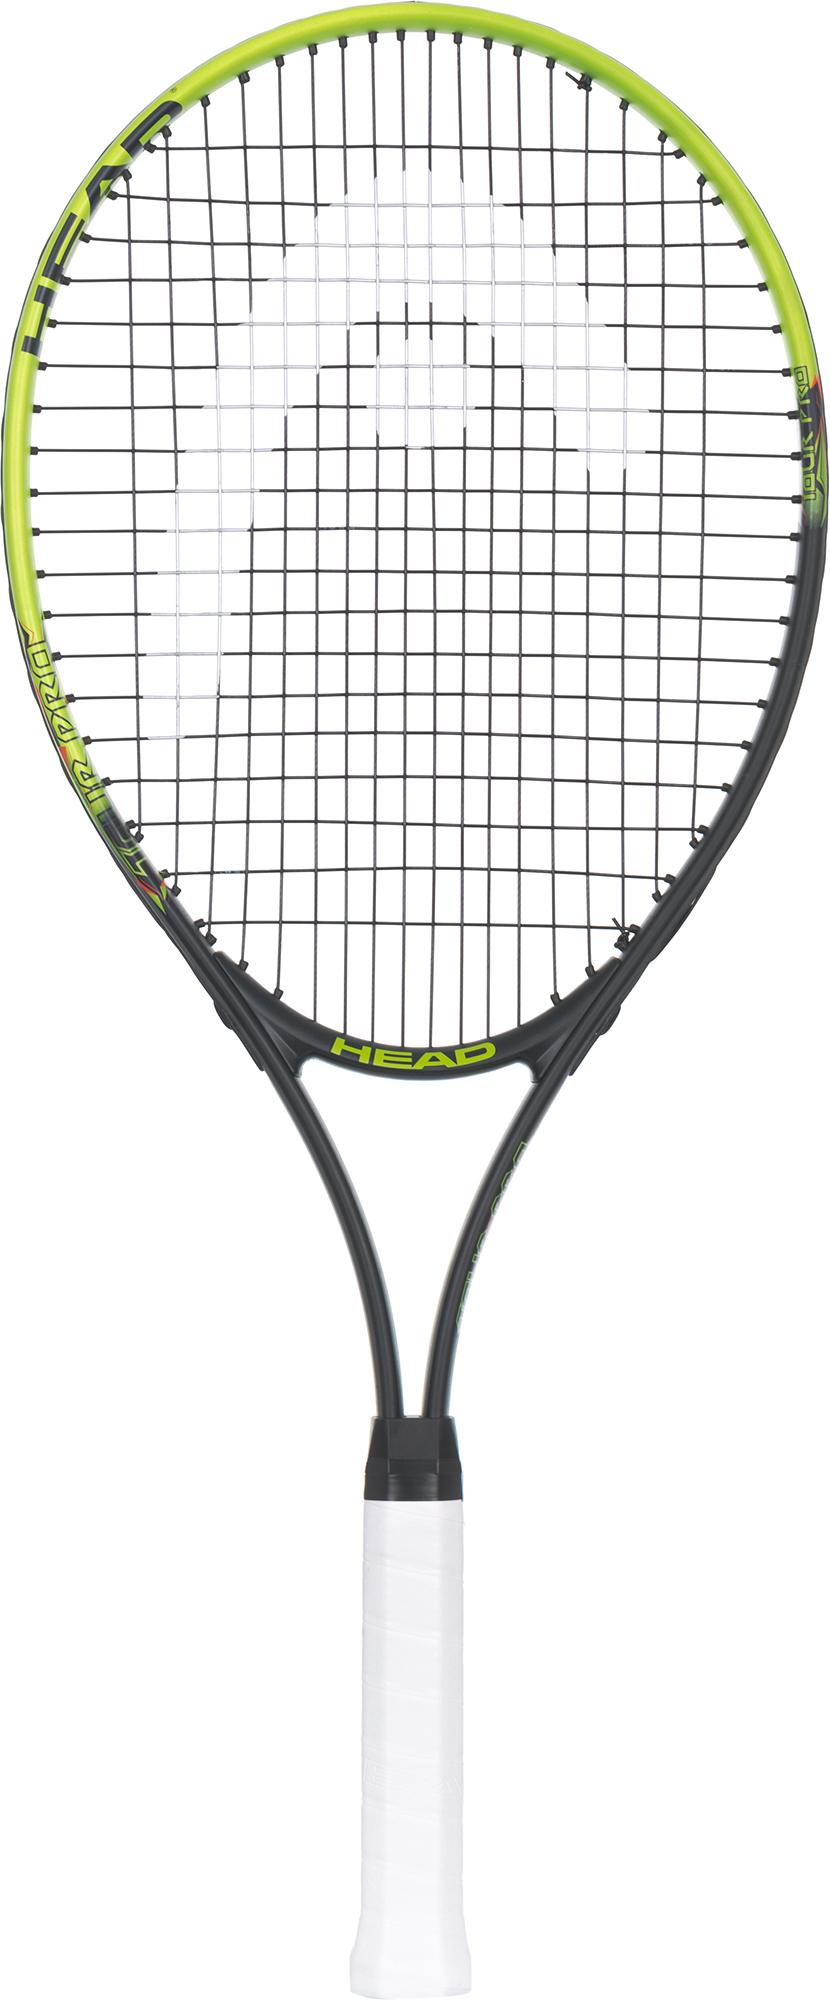 Head Ракетка для большого тенниса Head Tour Pro, размер 2